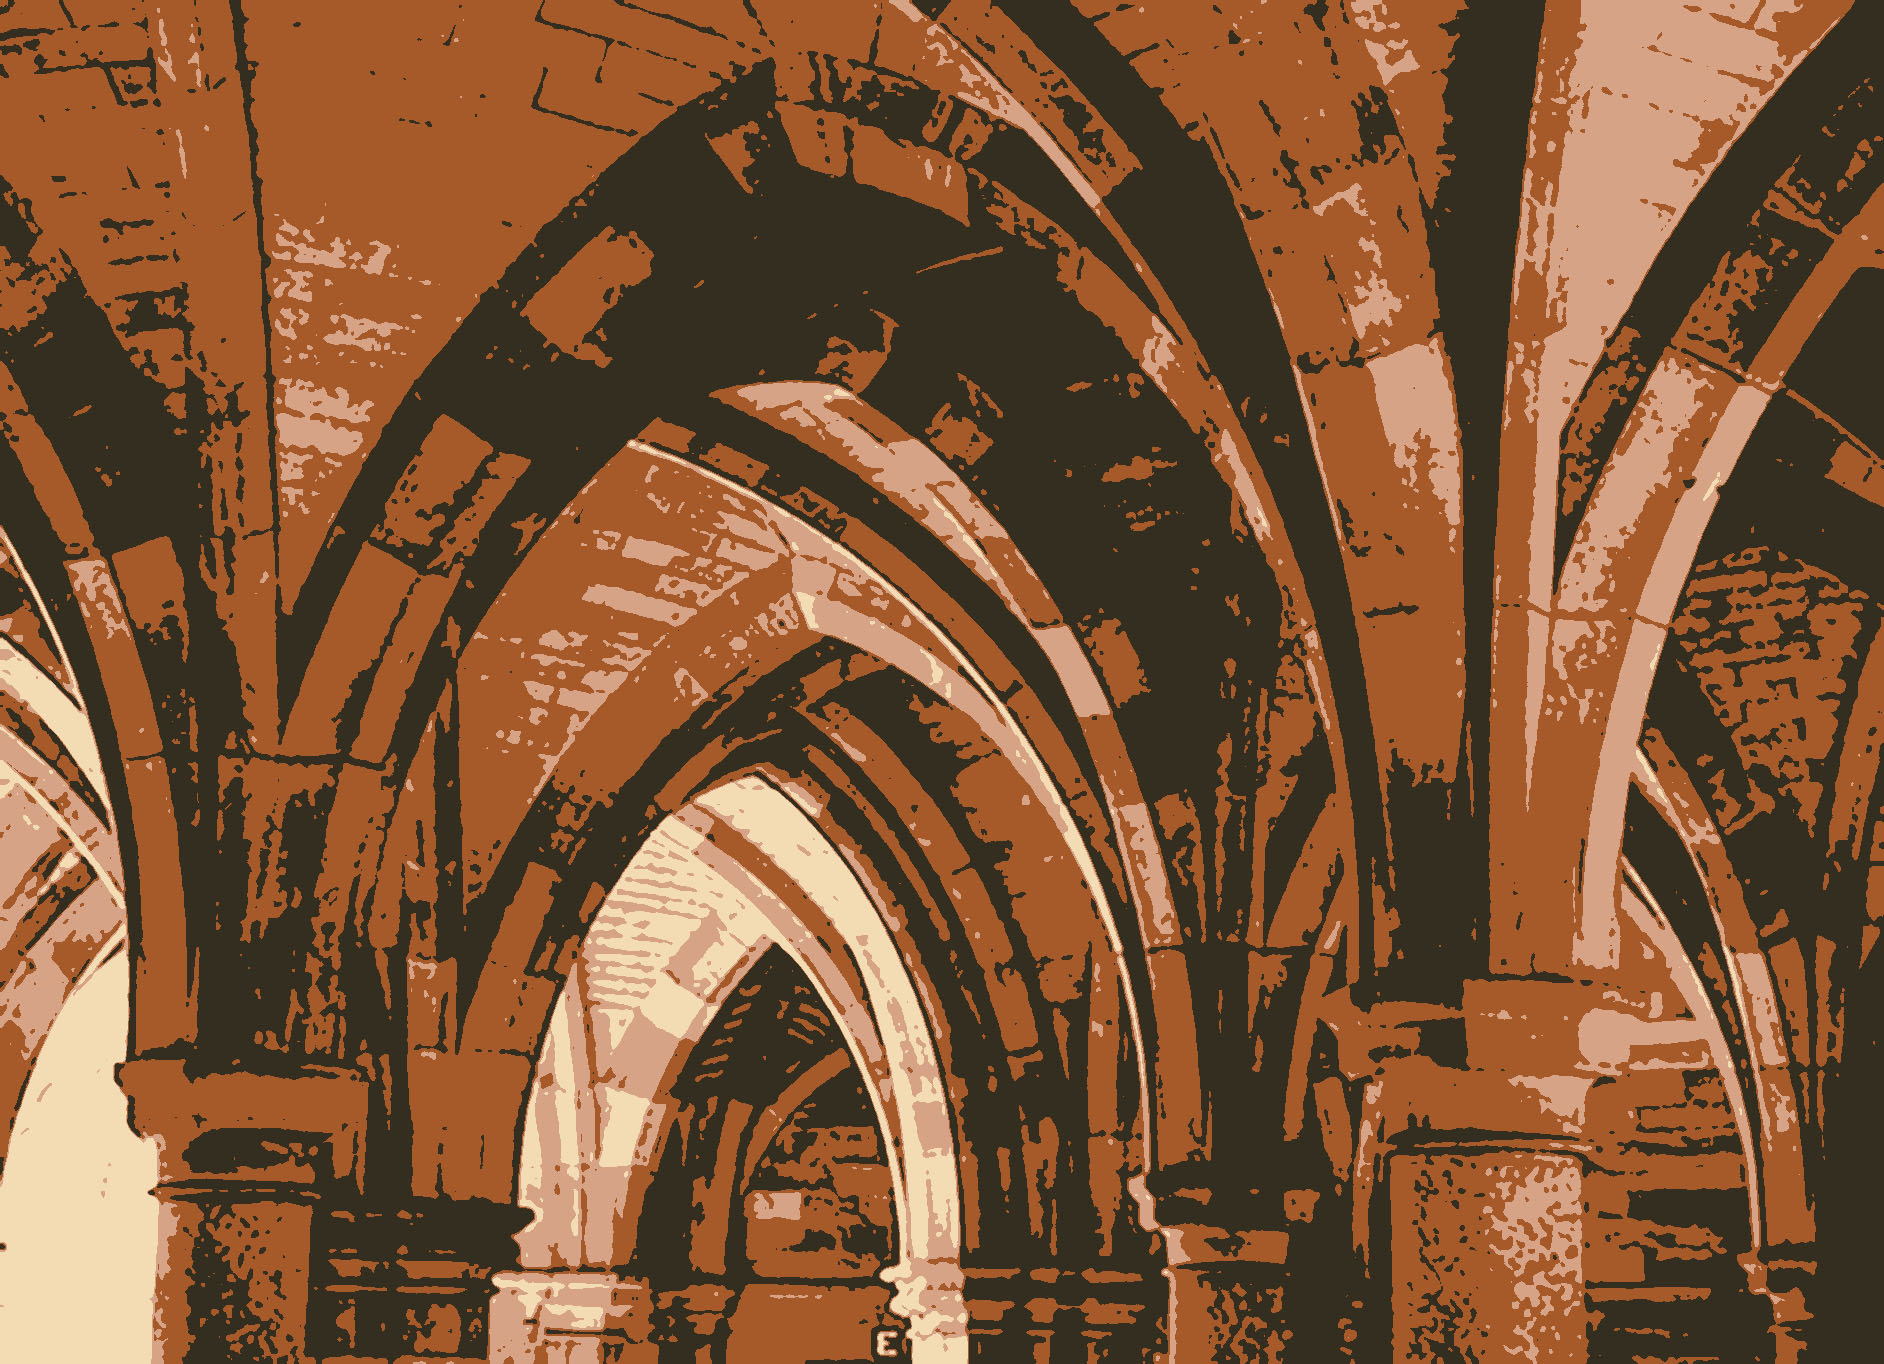 Glasgow University arches